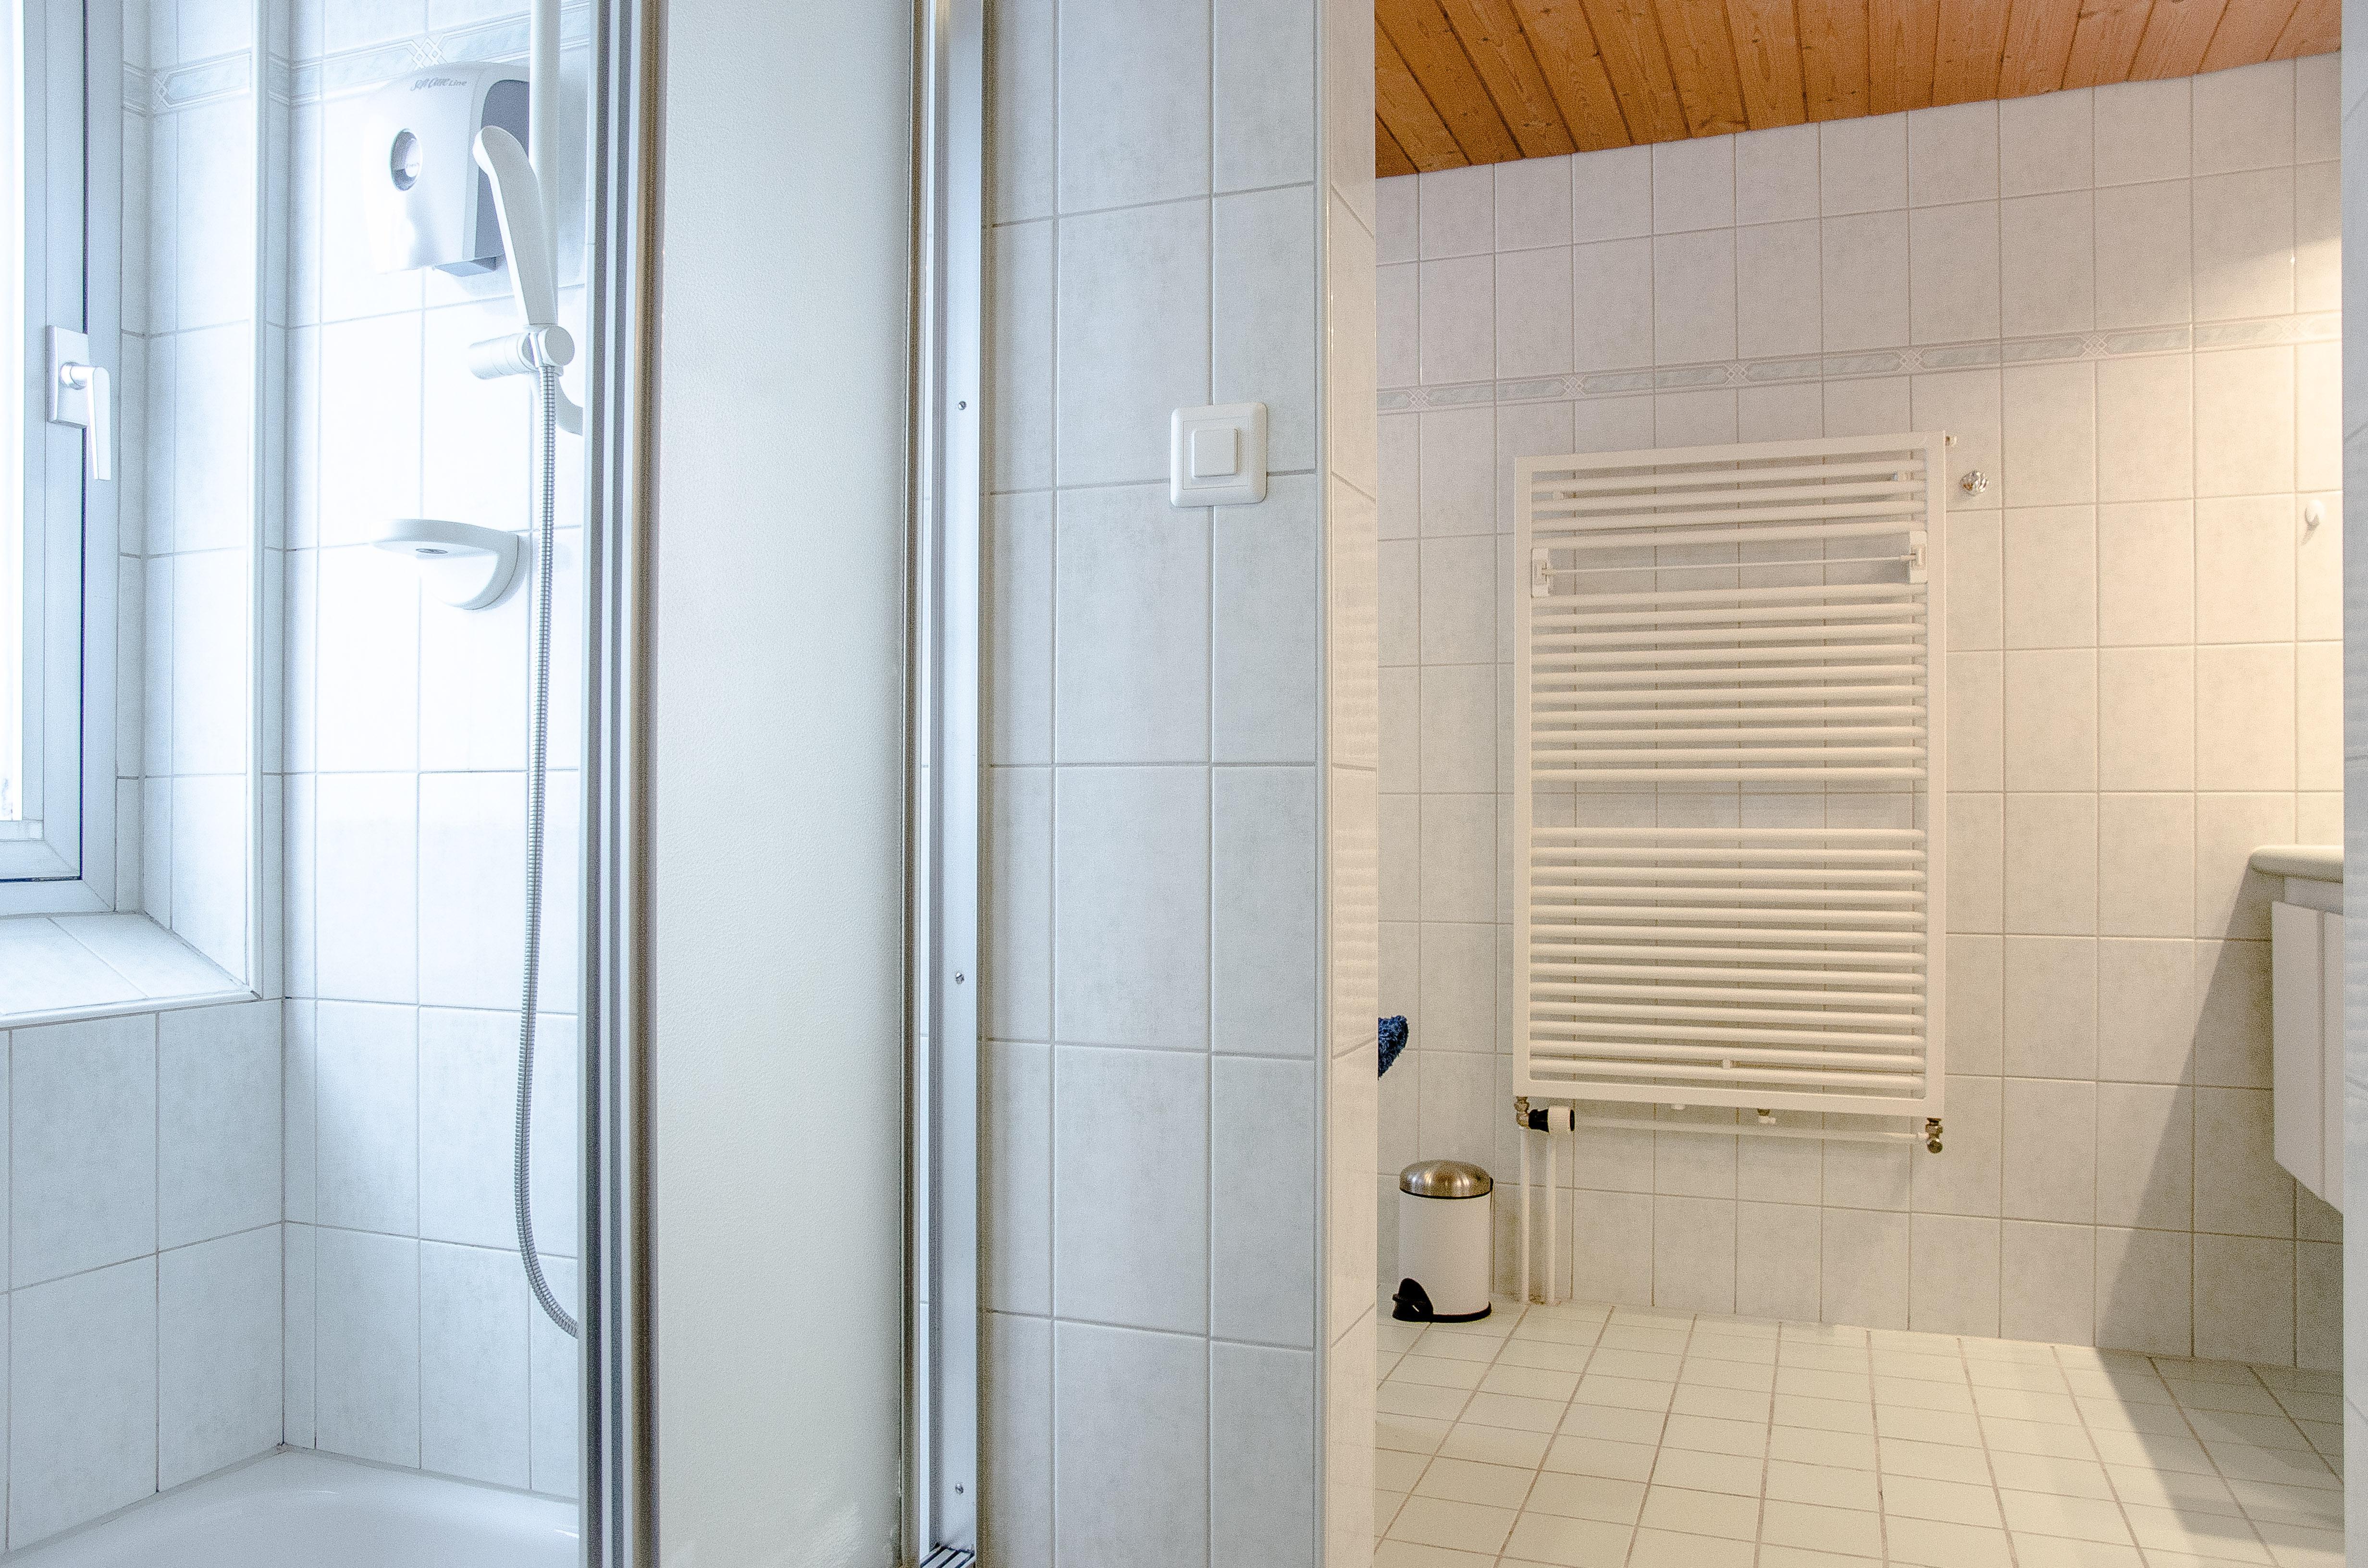 Appartement de vacances Apartment Bären 4 Bett Wohnung Obj. Nr. 4101 (2633980), Guttannen, Meiringen - Hasliberg, Oberland bernois, Suisse, image 20